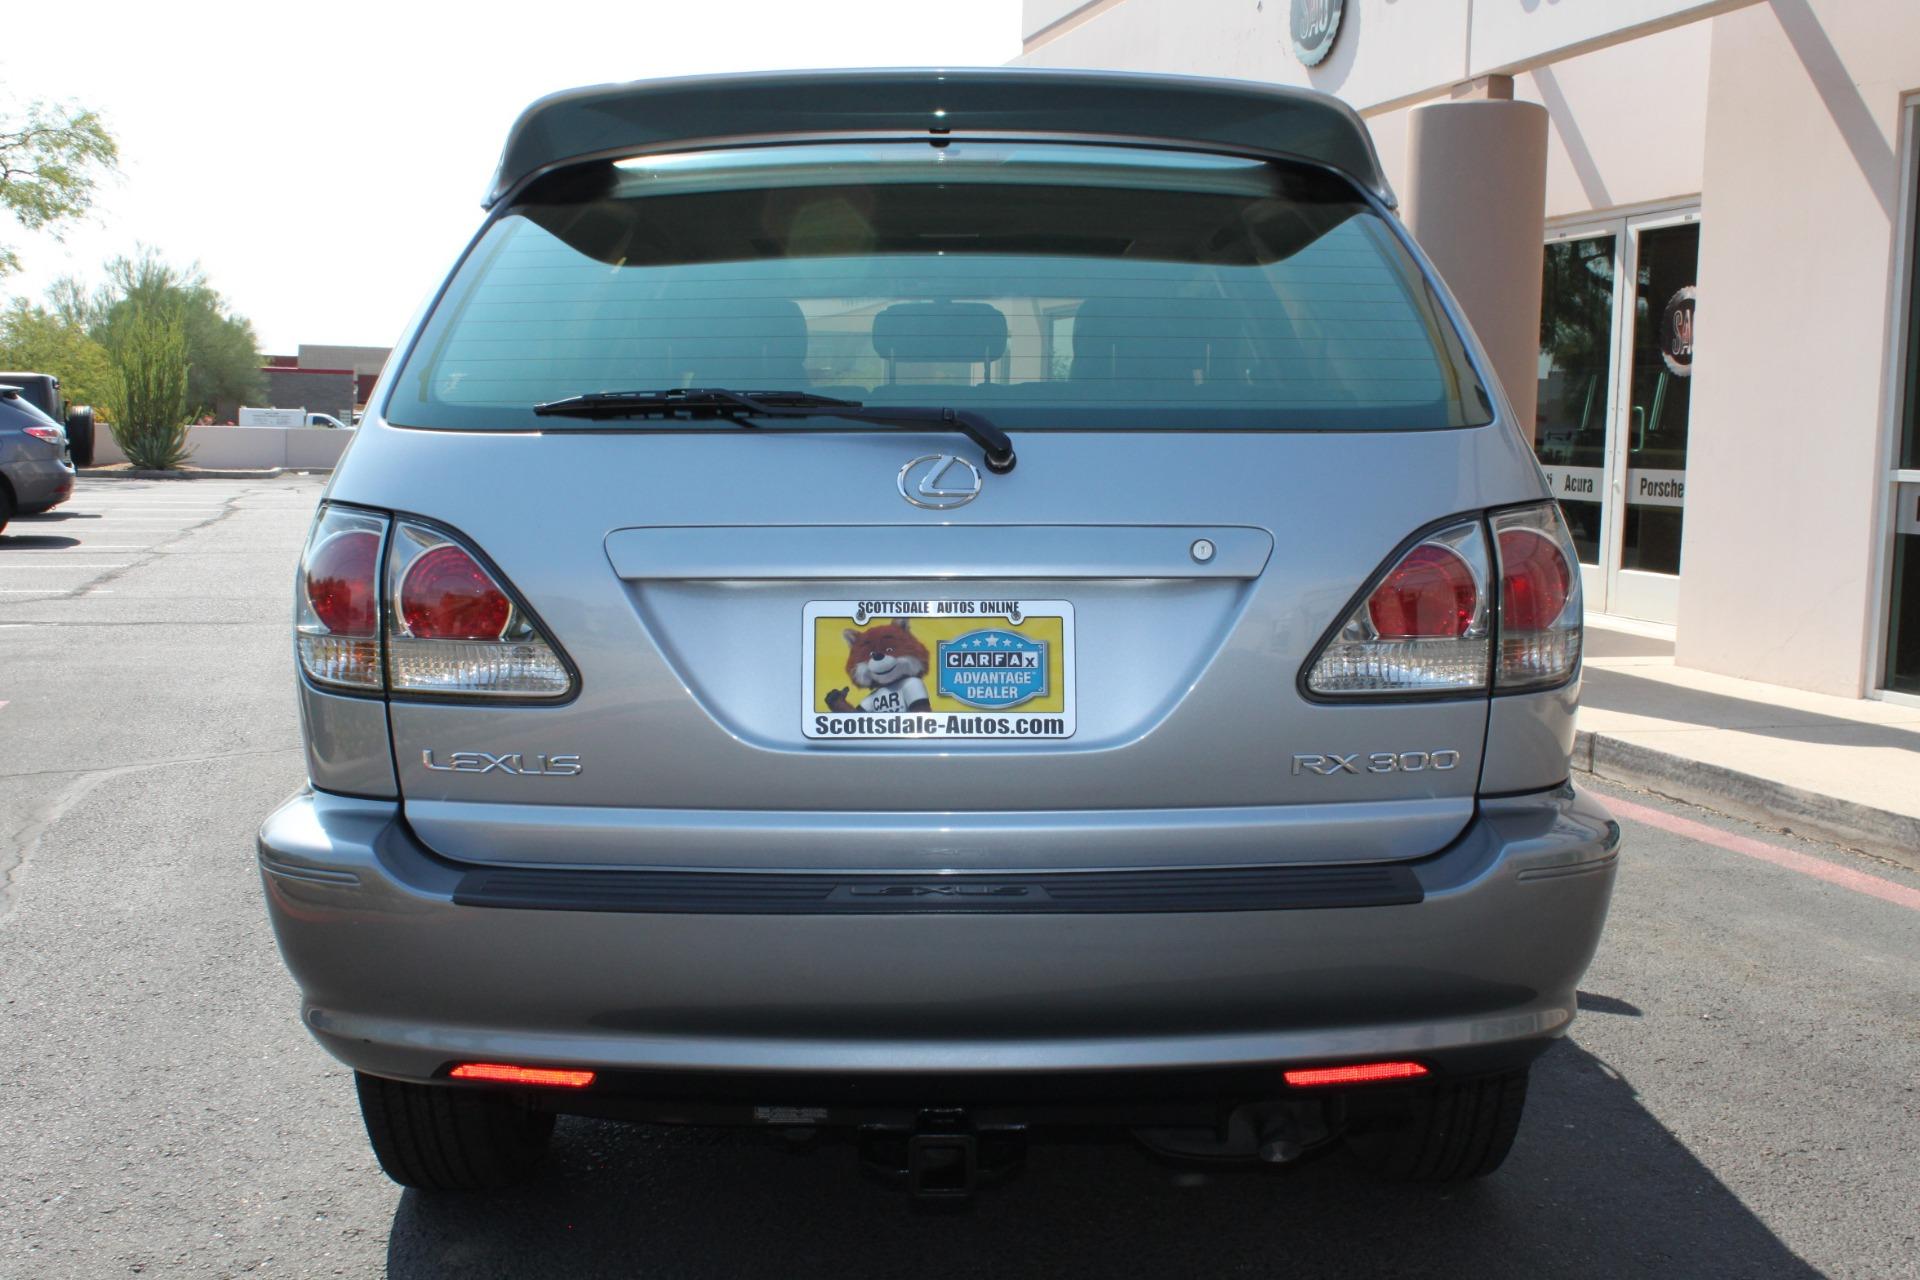 Used-2003-Lexus-RX-300-AWD-Mopar